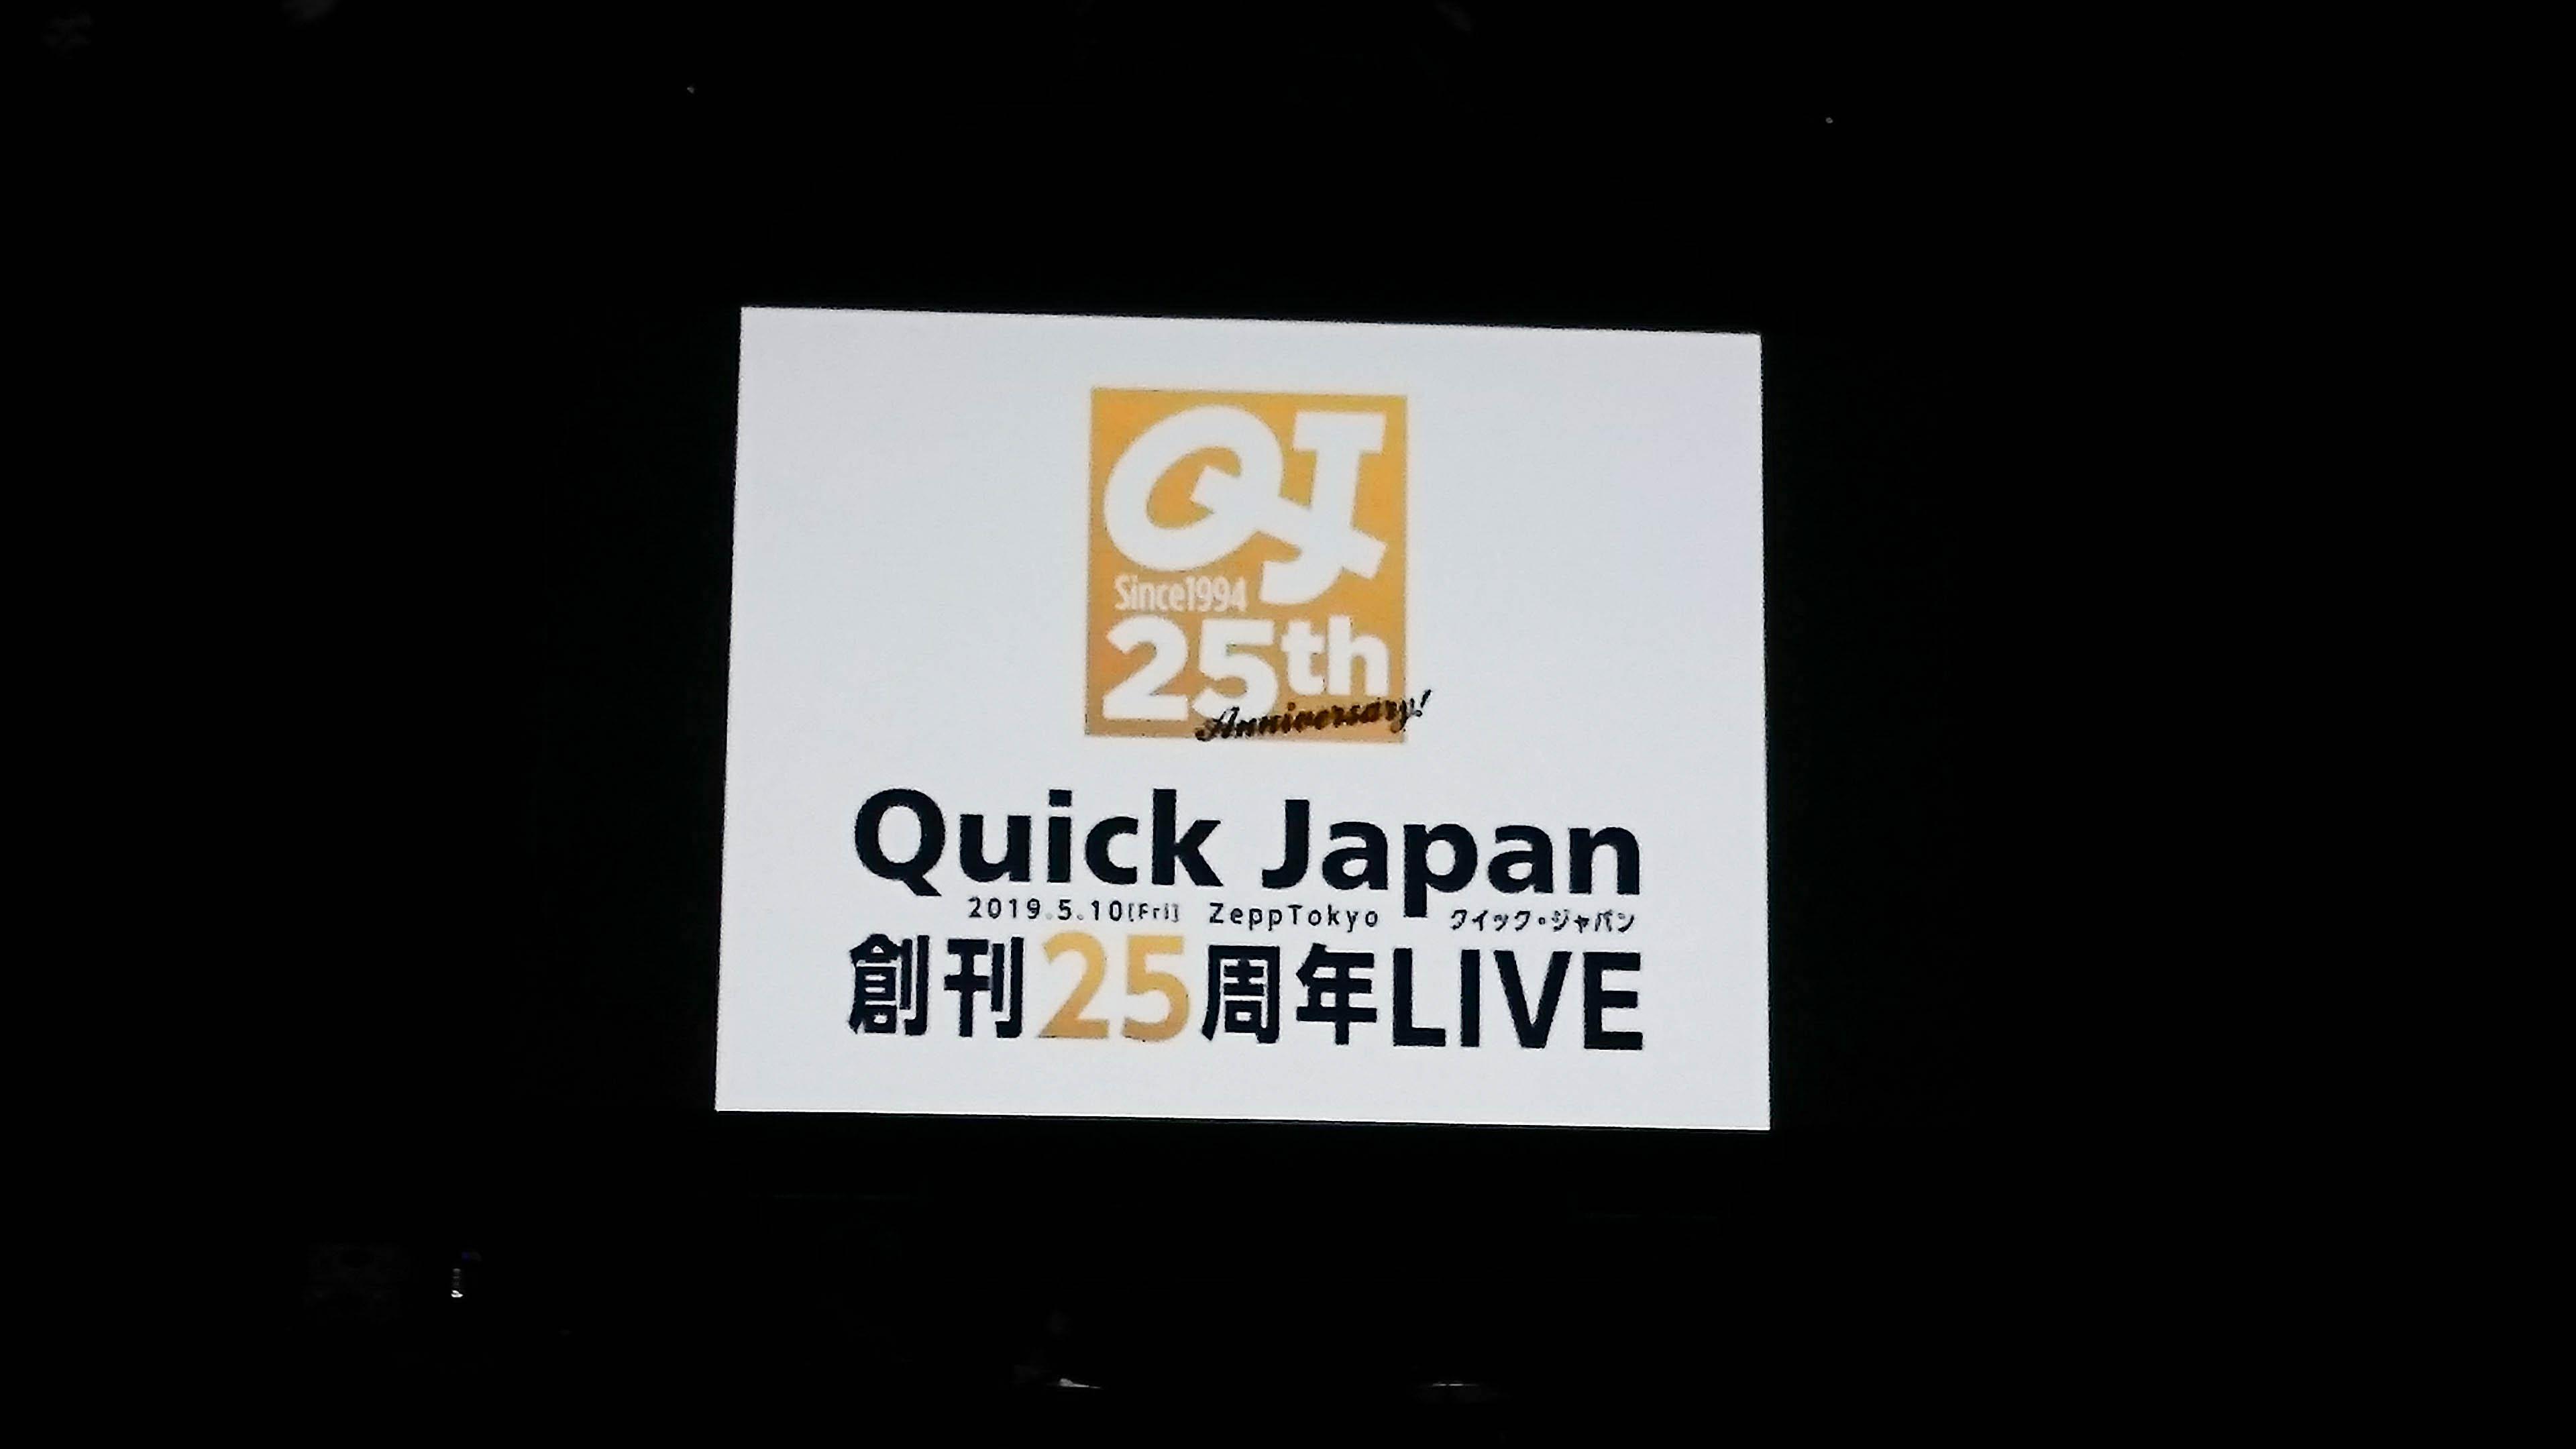 『Quick Japan』創刊25周年LIVEが色々豪華だった件